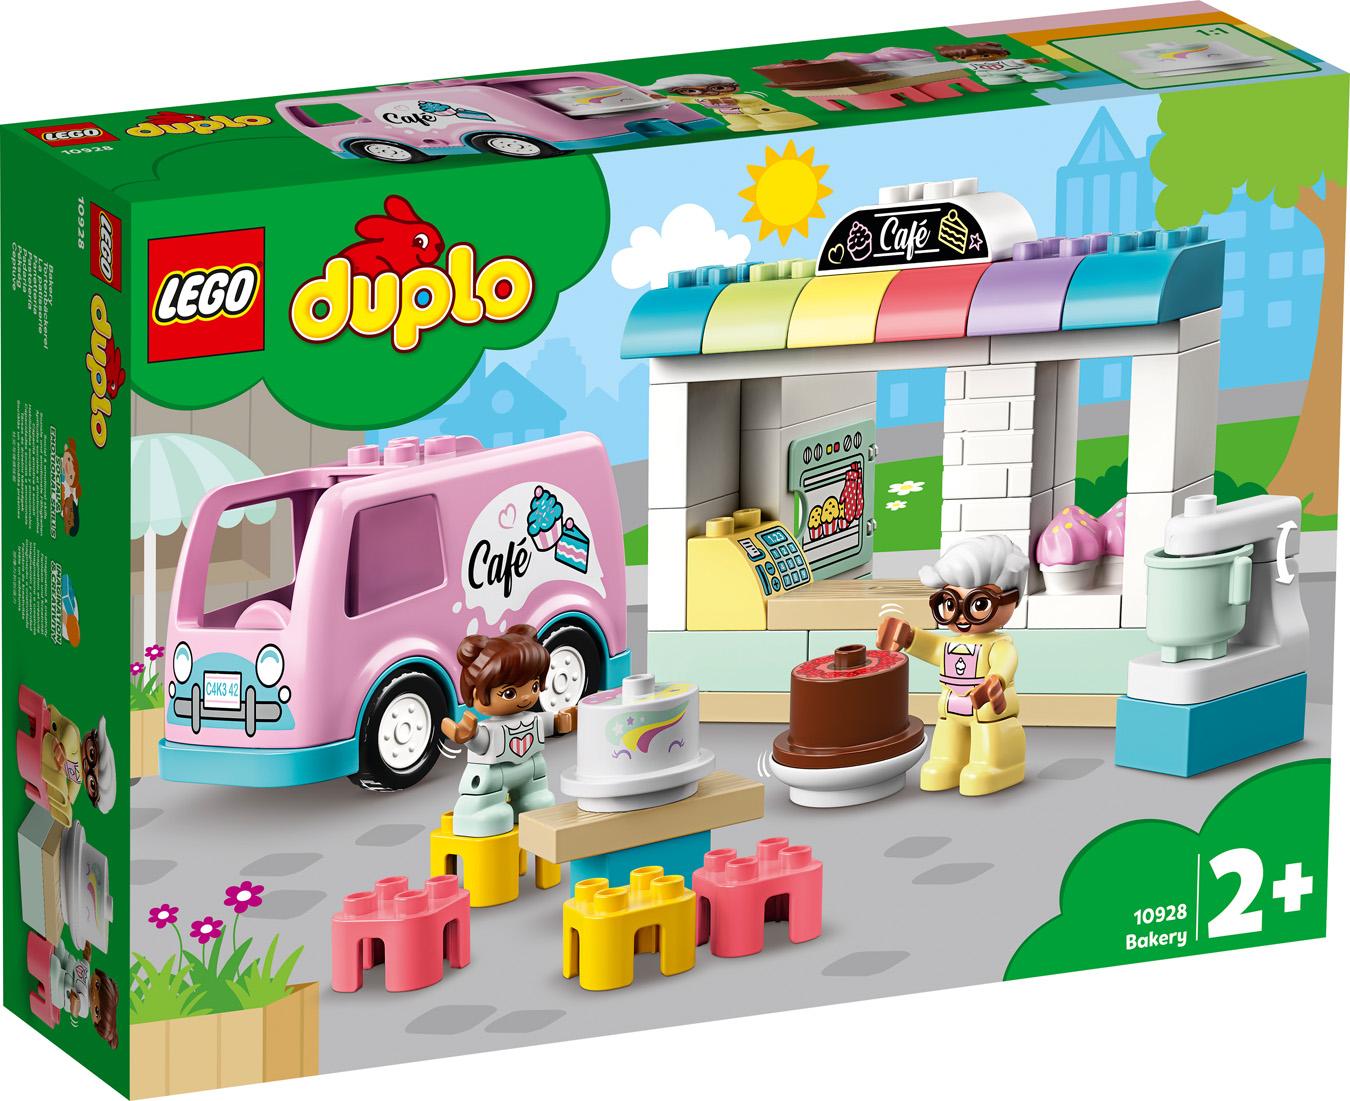 La pâtisserie - LEGO DUPLO - 10928